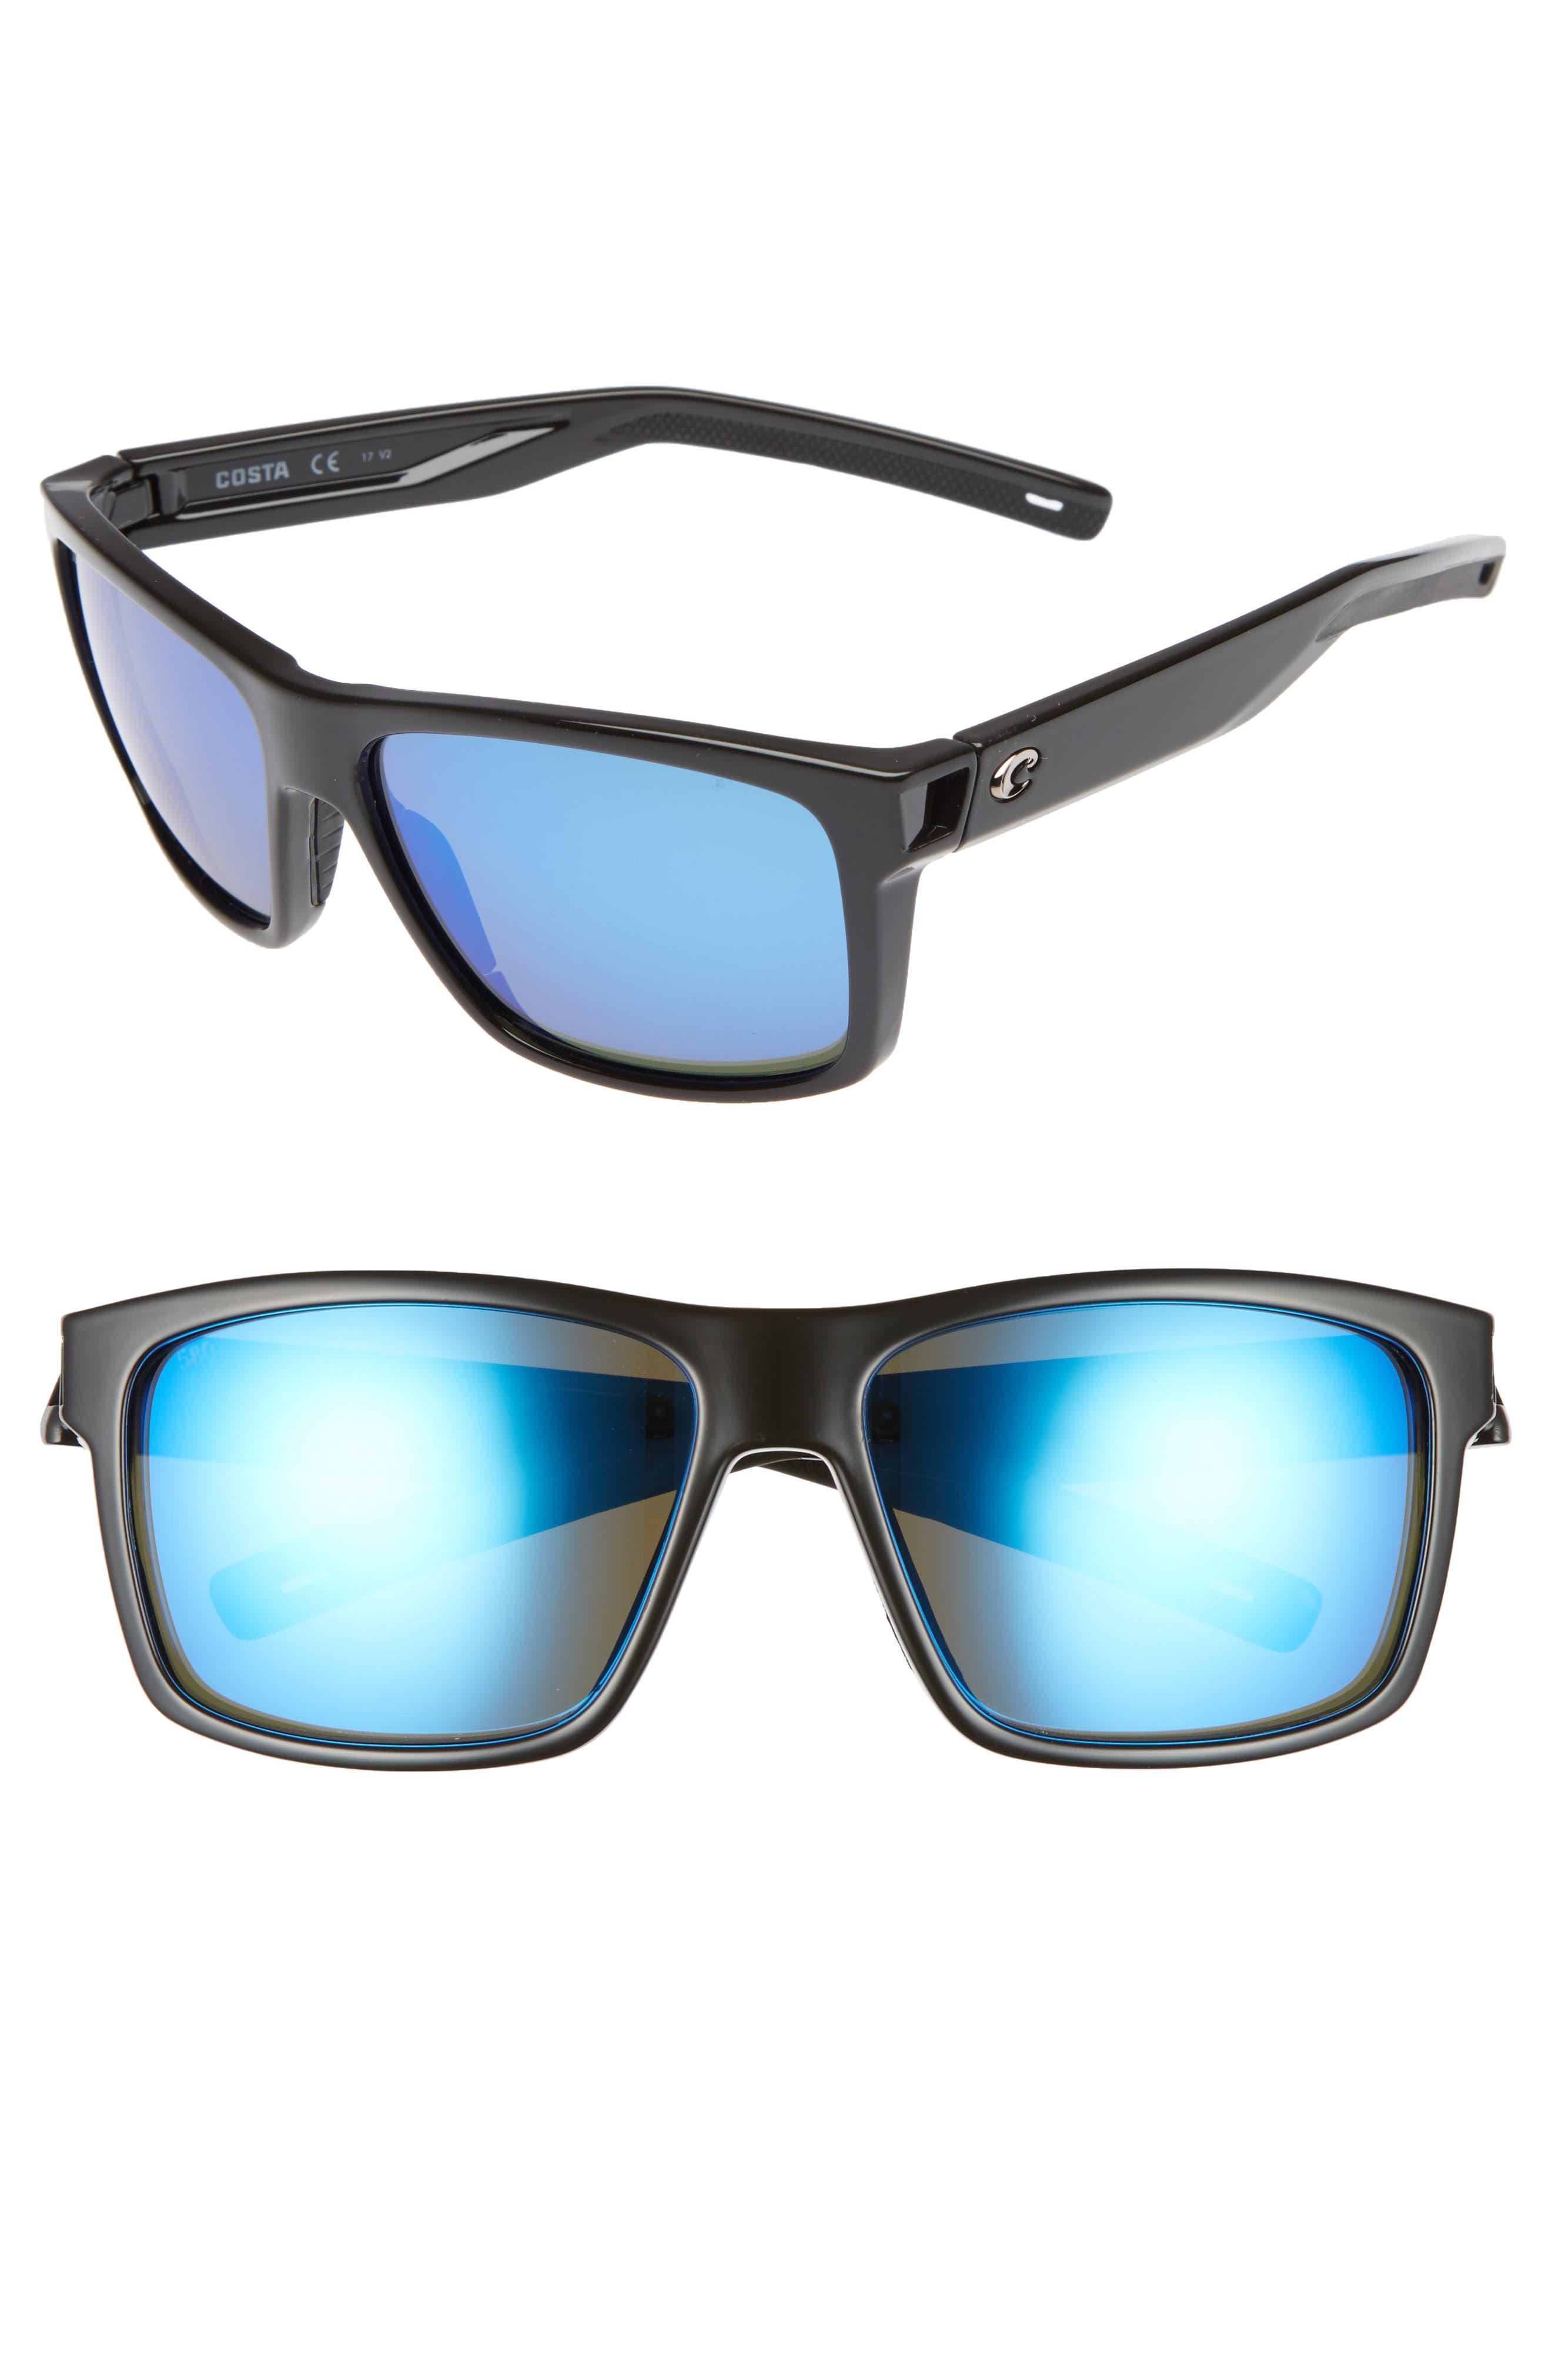 Slack Tide 58mm Polarized Sunglasses,                         Main,                         color, SHINY BLACK/ BLUE MIRROR